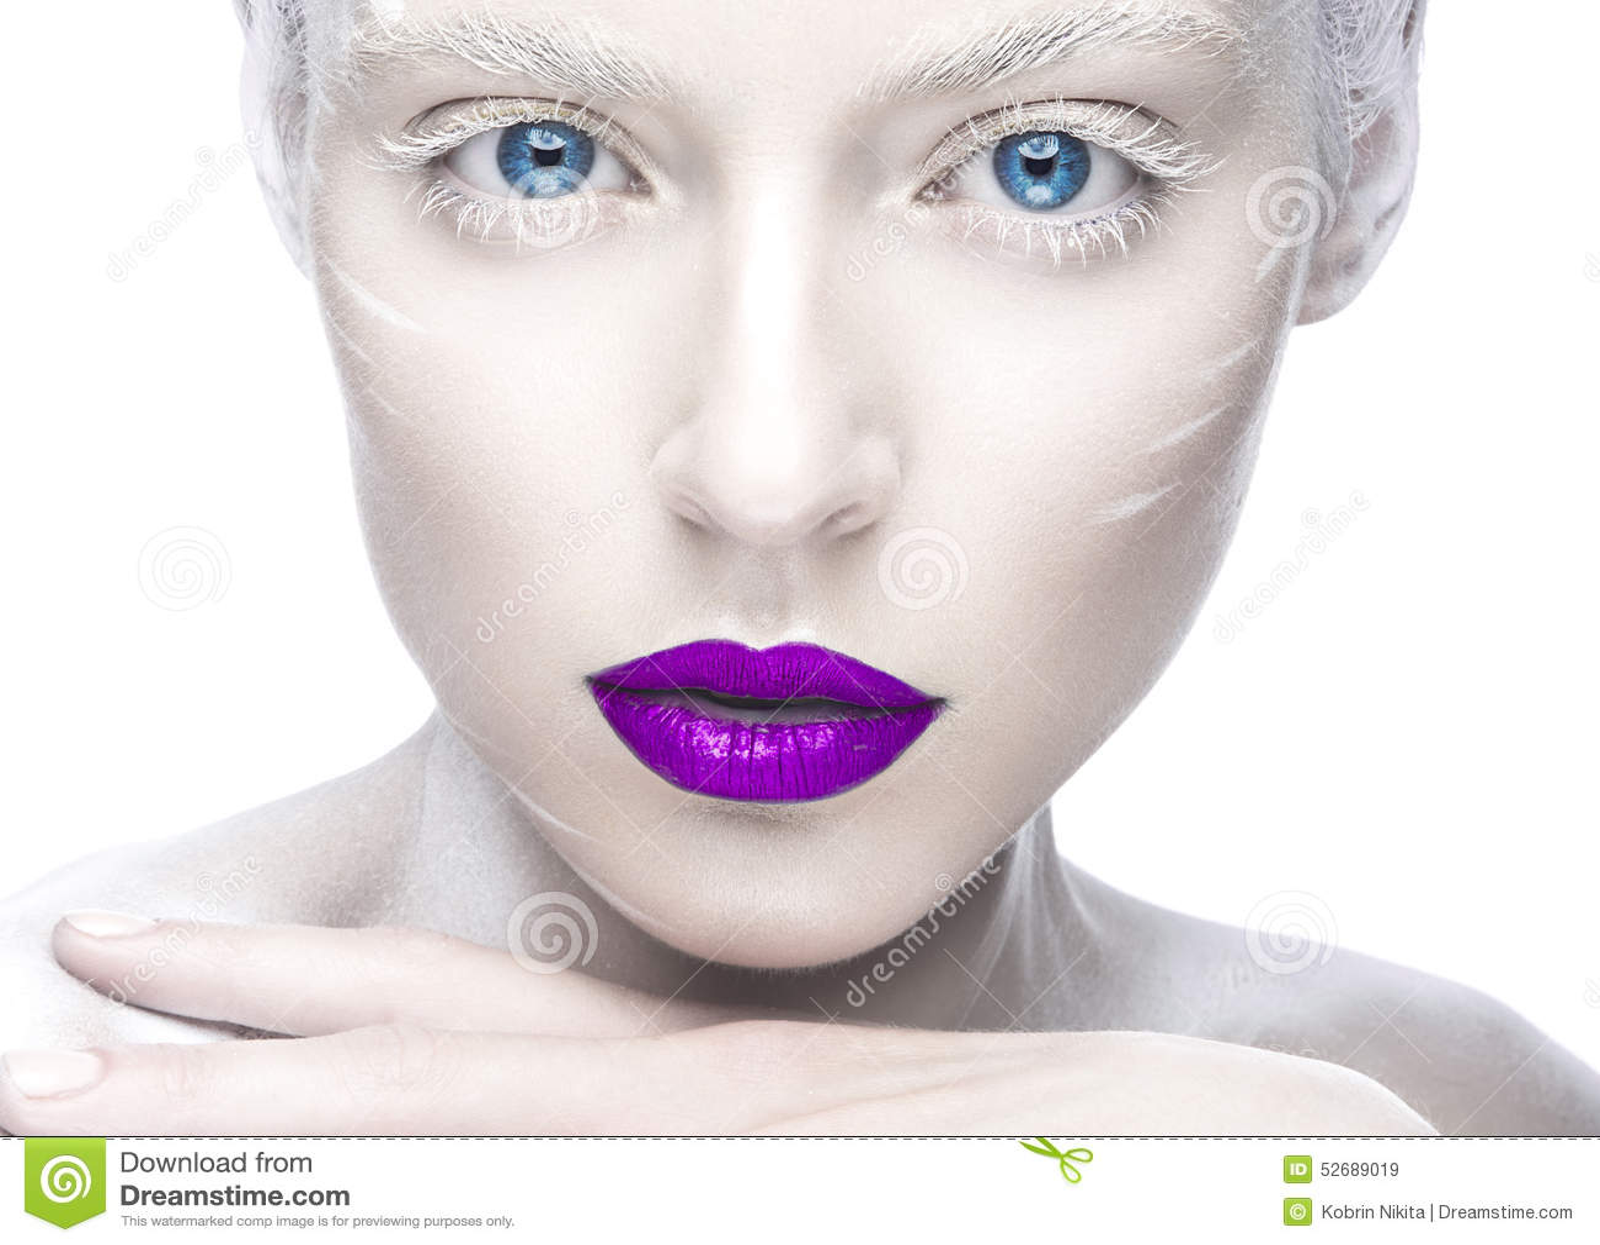 Ideal perfect white woman scandinavian beauty - 3 7